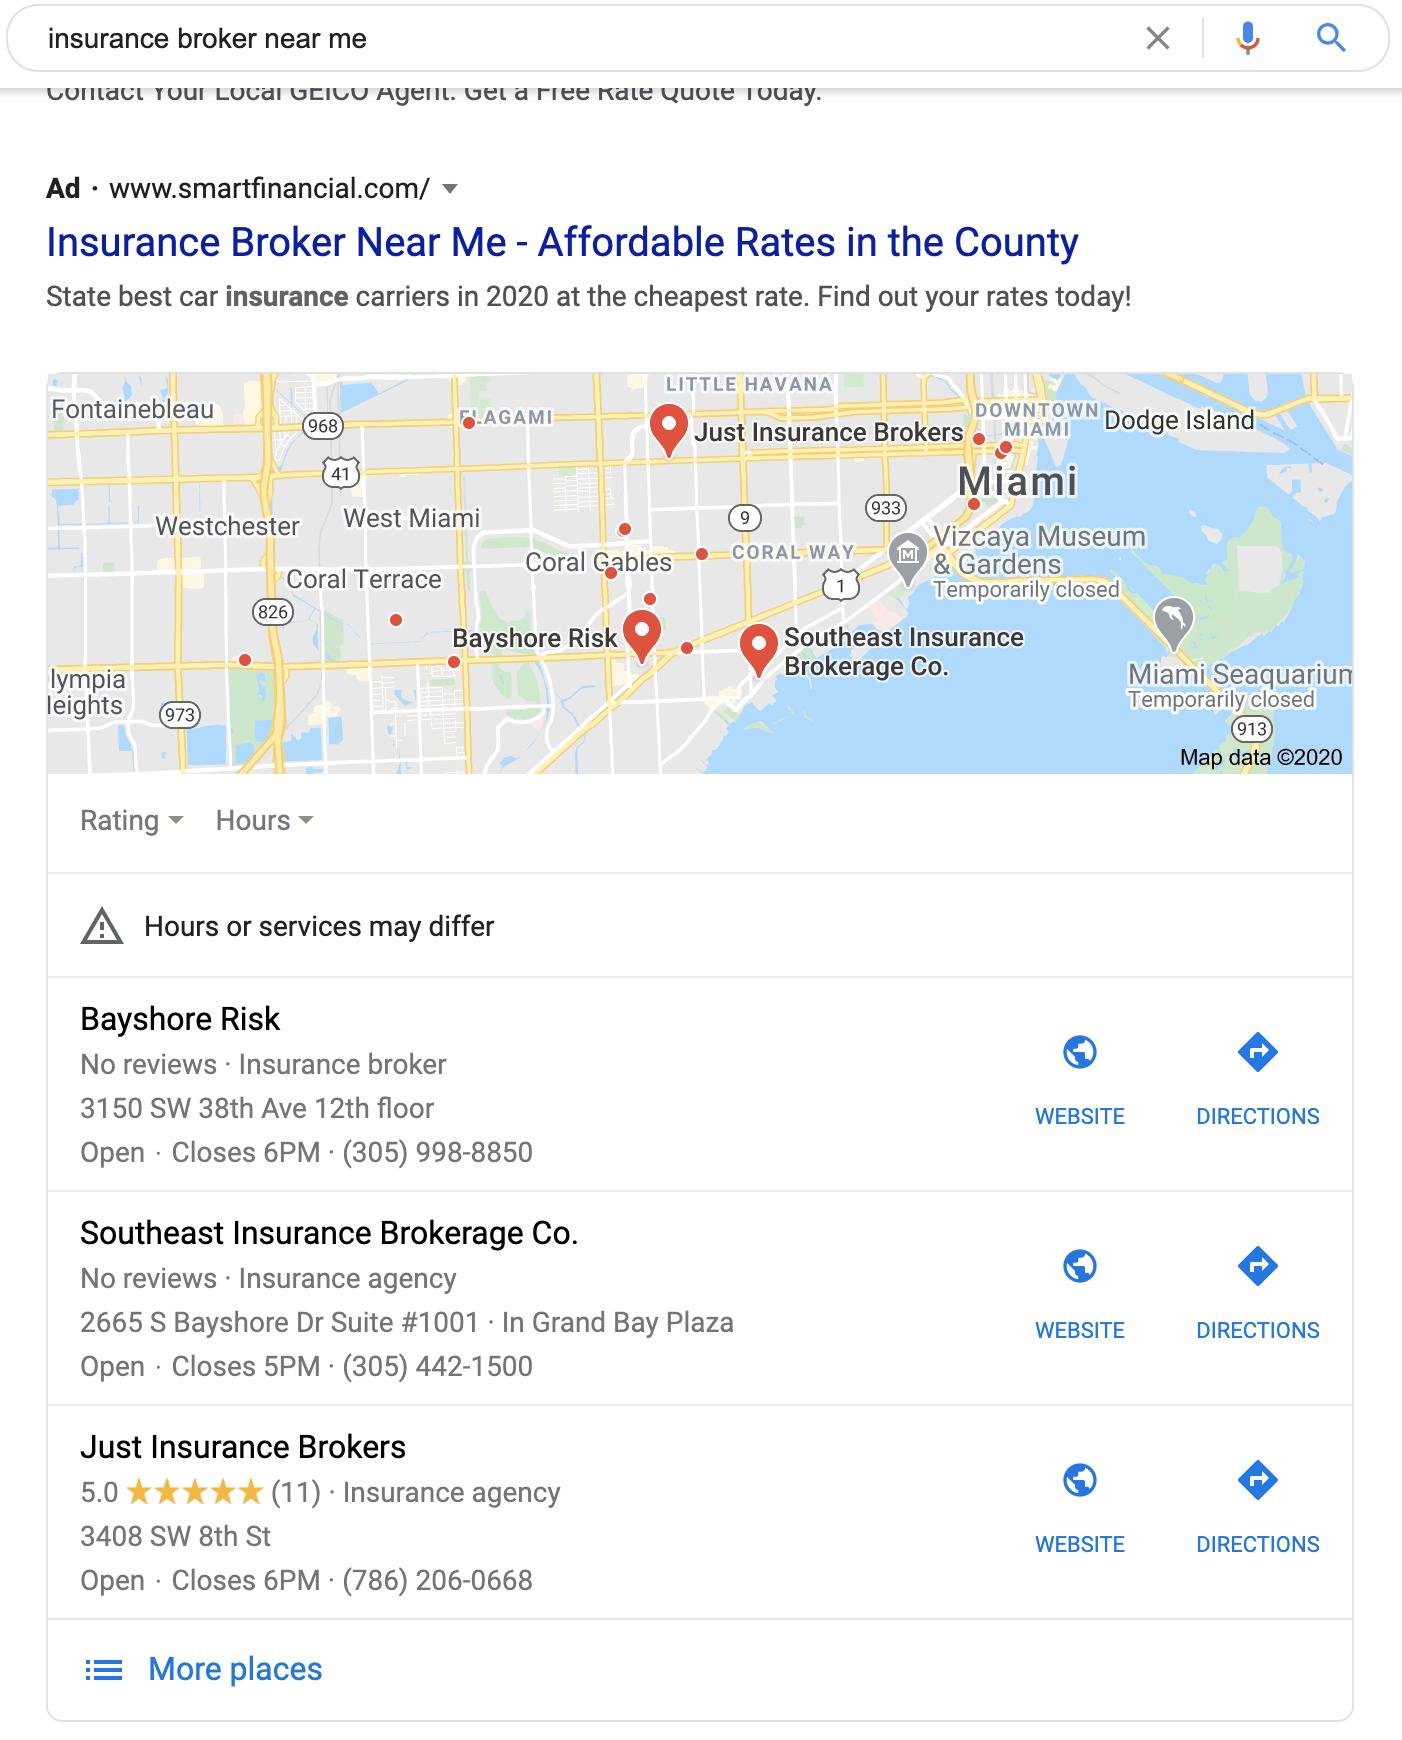 insurance_broker_near_me